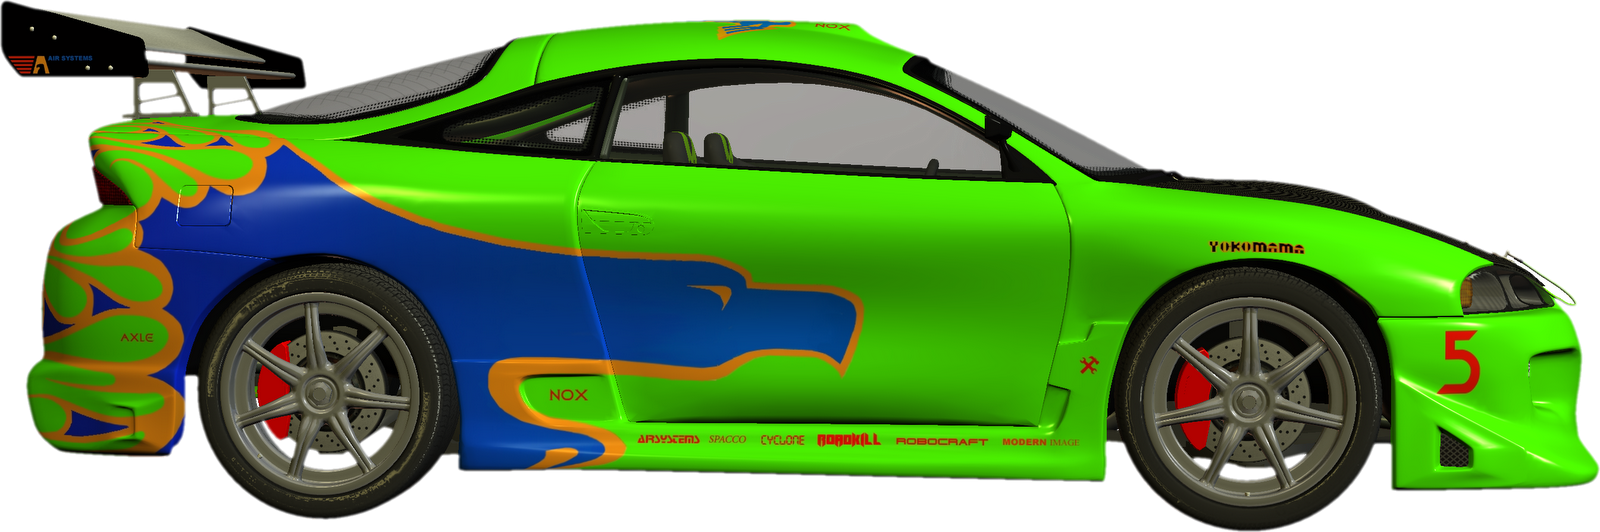 Free Race Car Cliparts, Download Free Clip Art, Free Clip.